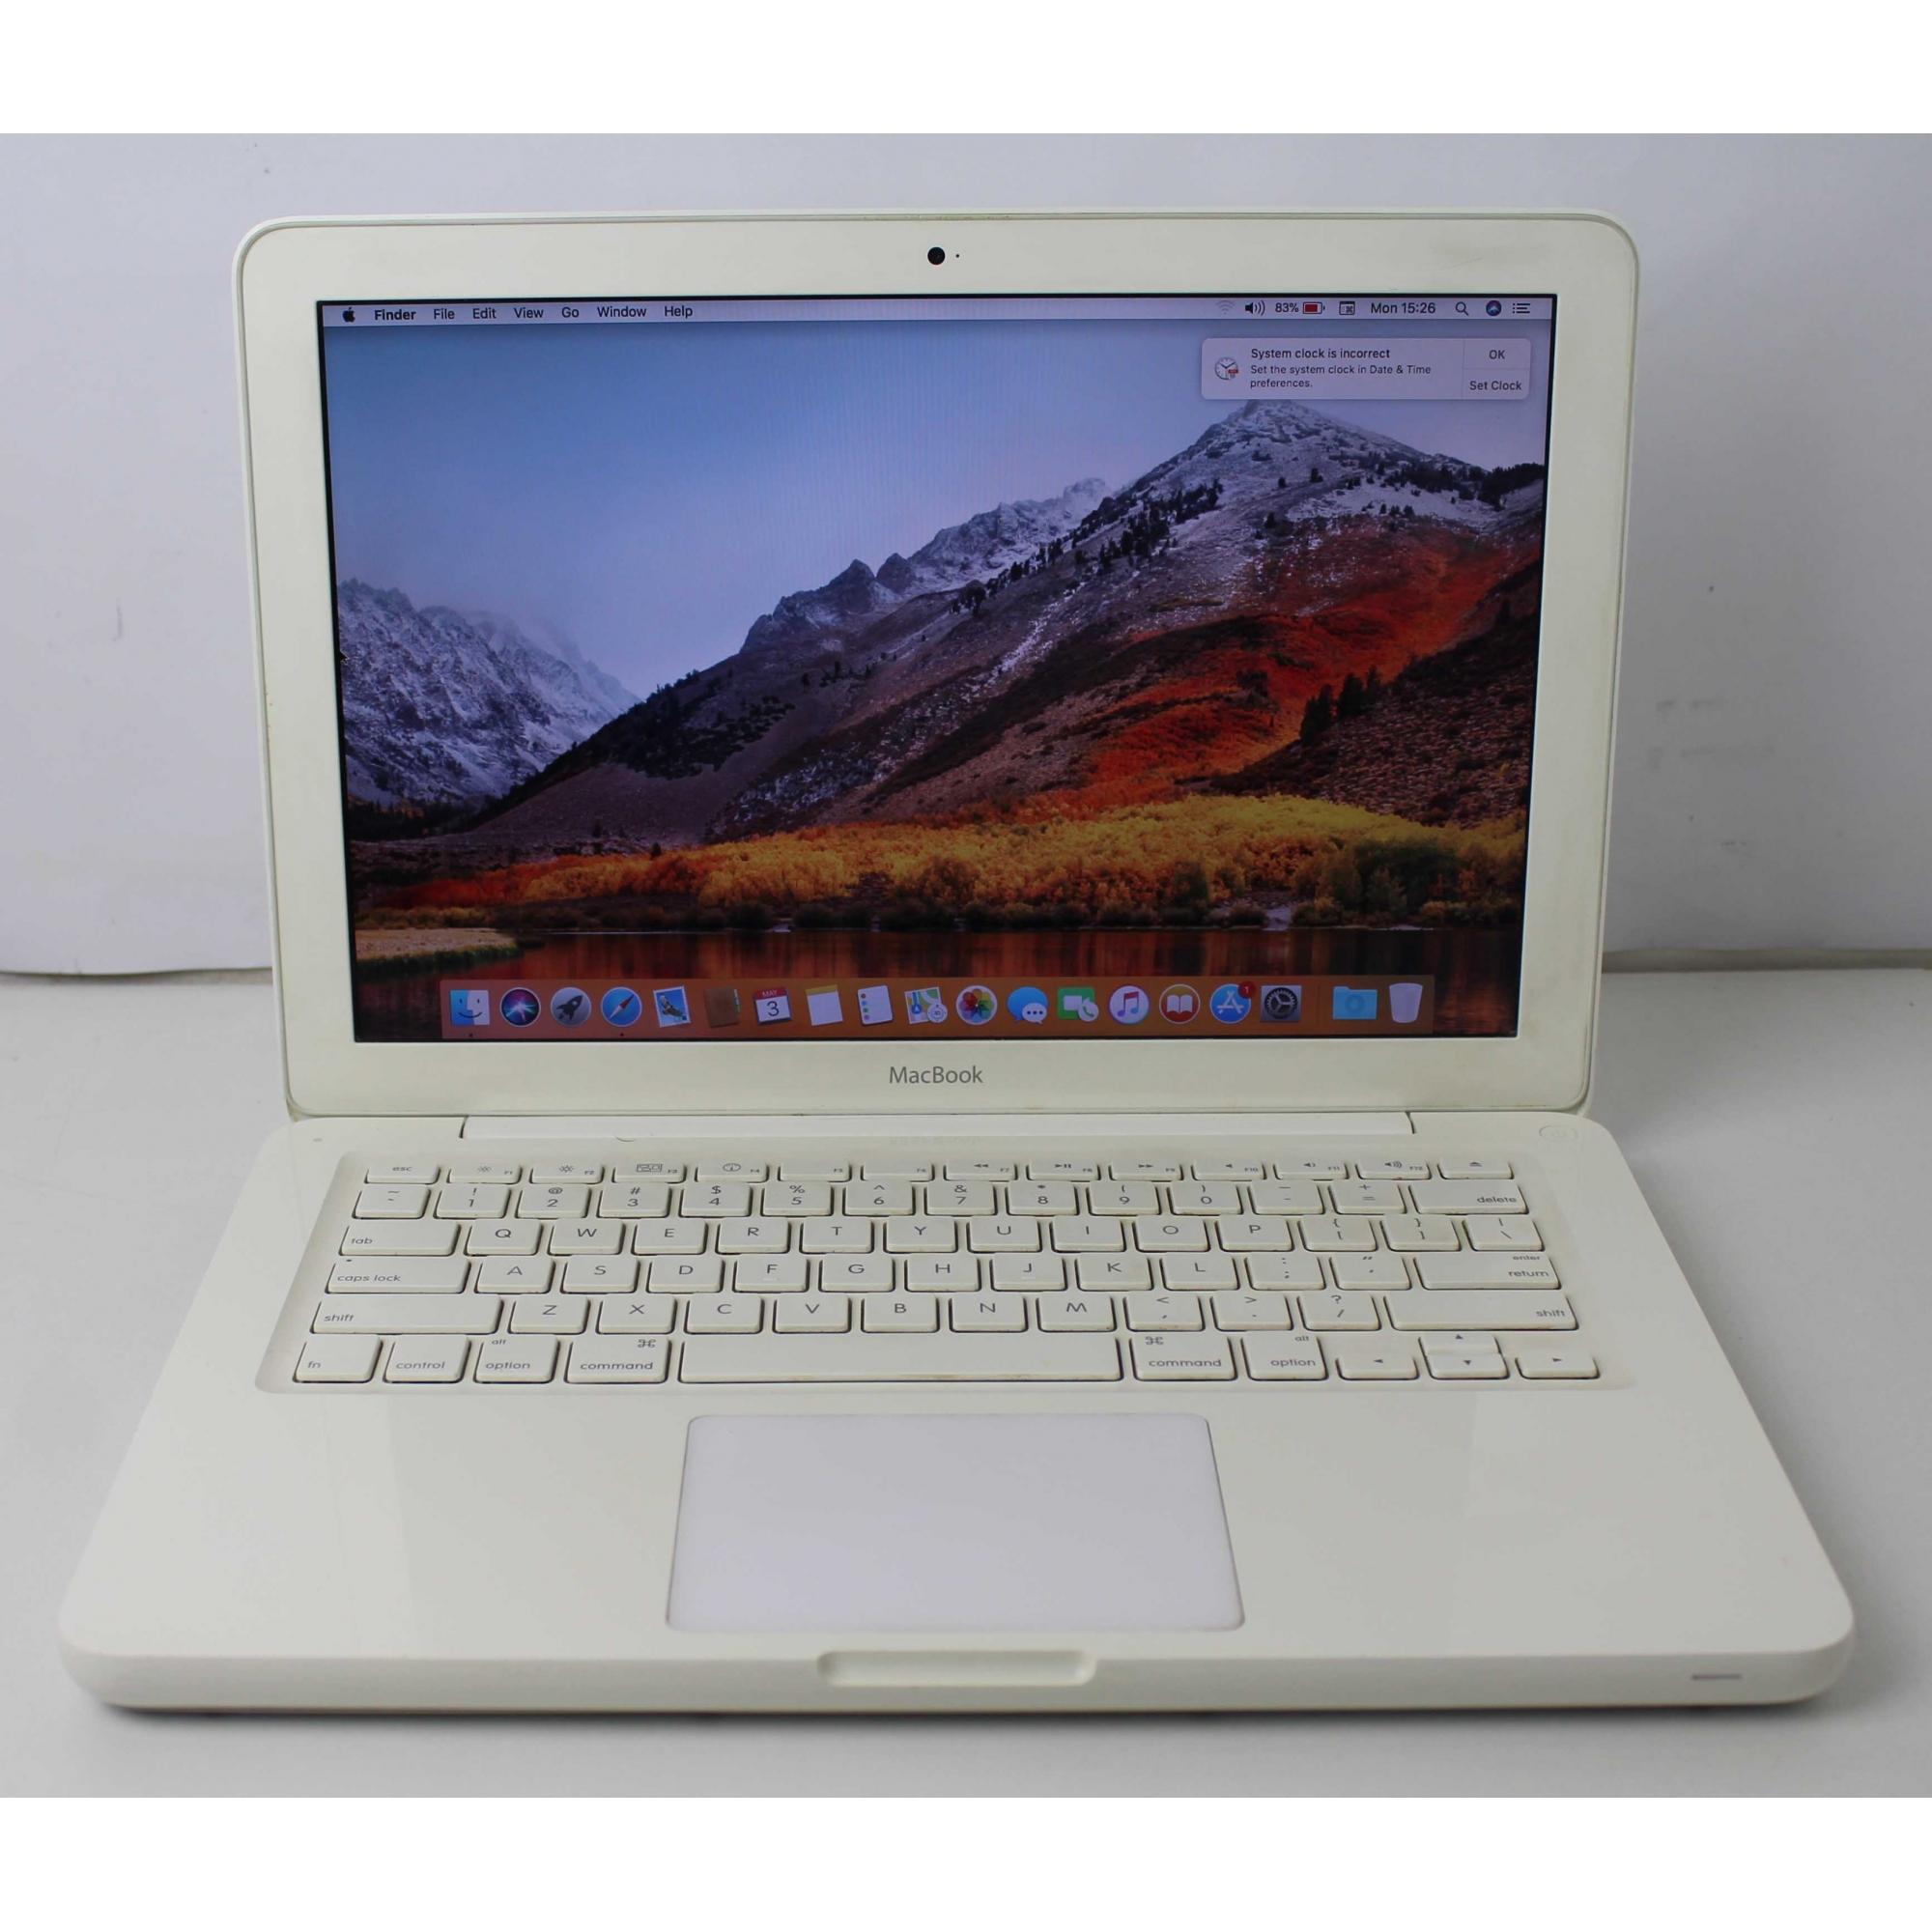 "Macbook White MC516LL/A 13.3"" Intel Core 2 Duo 2.4GHz 4GB HD-250GB"